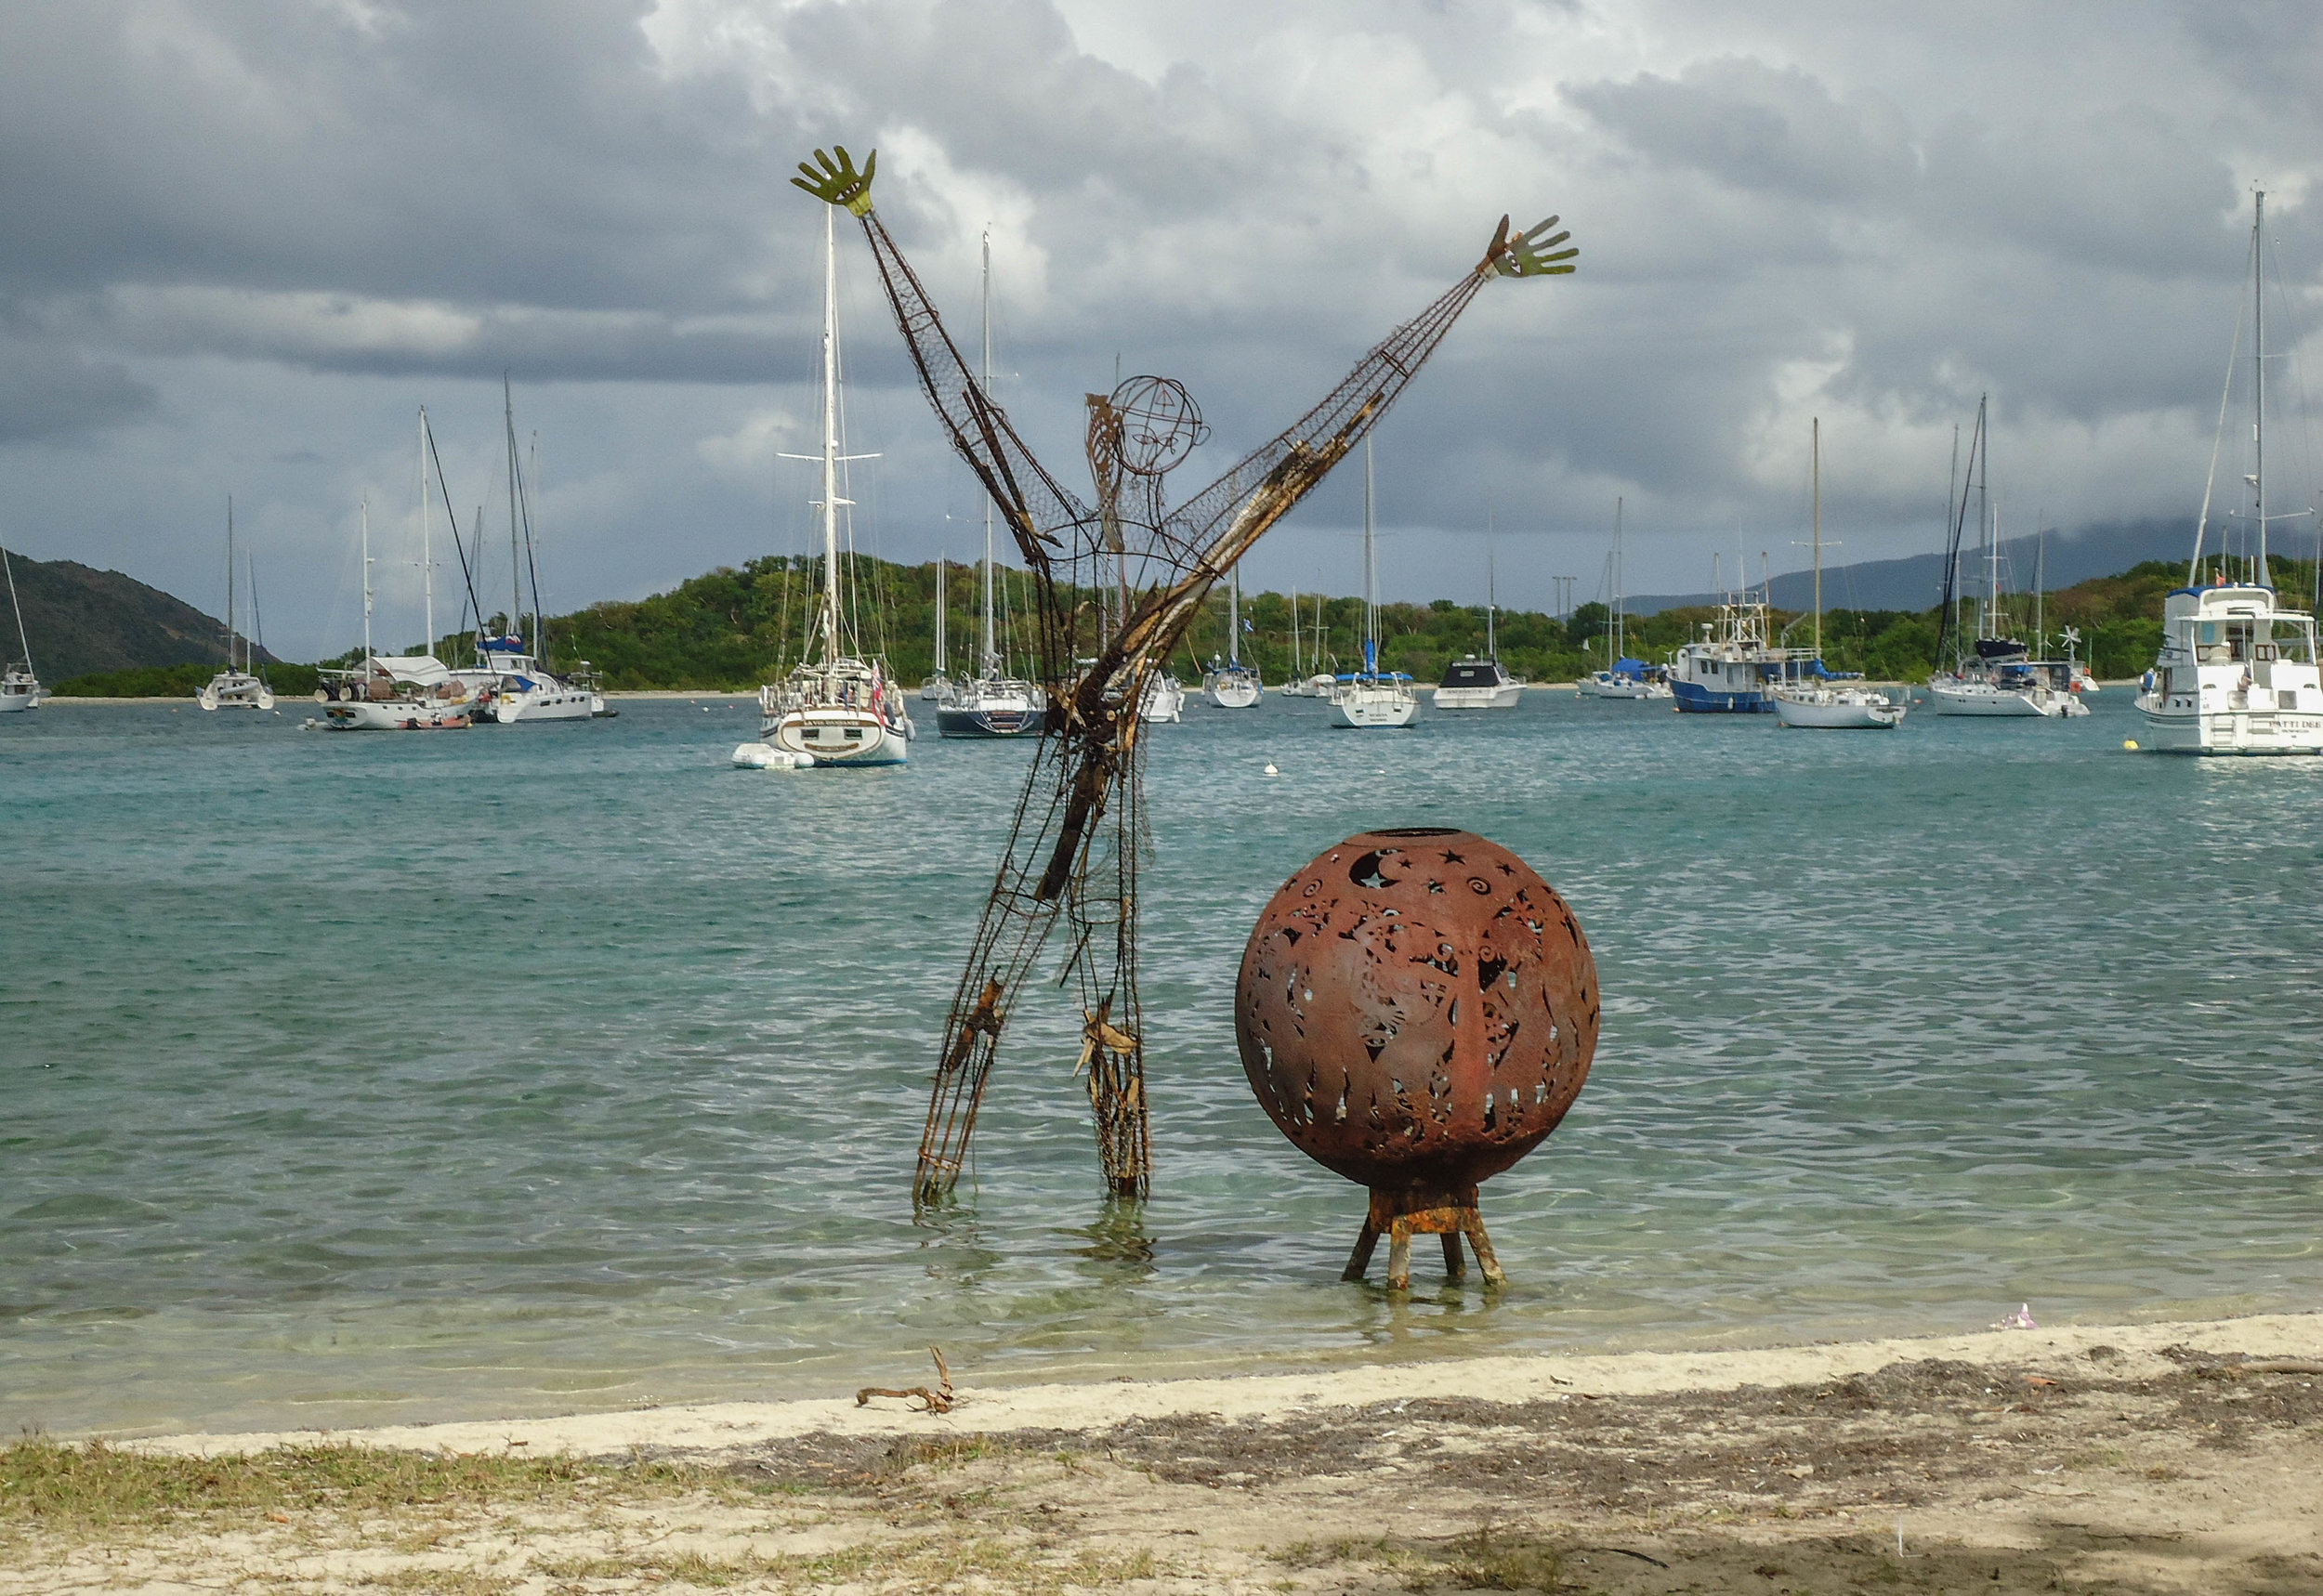 Trellis Bay - Tortola, BVI